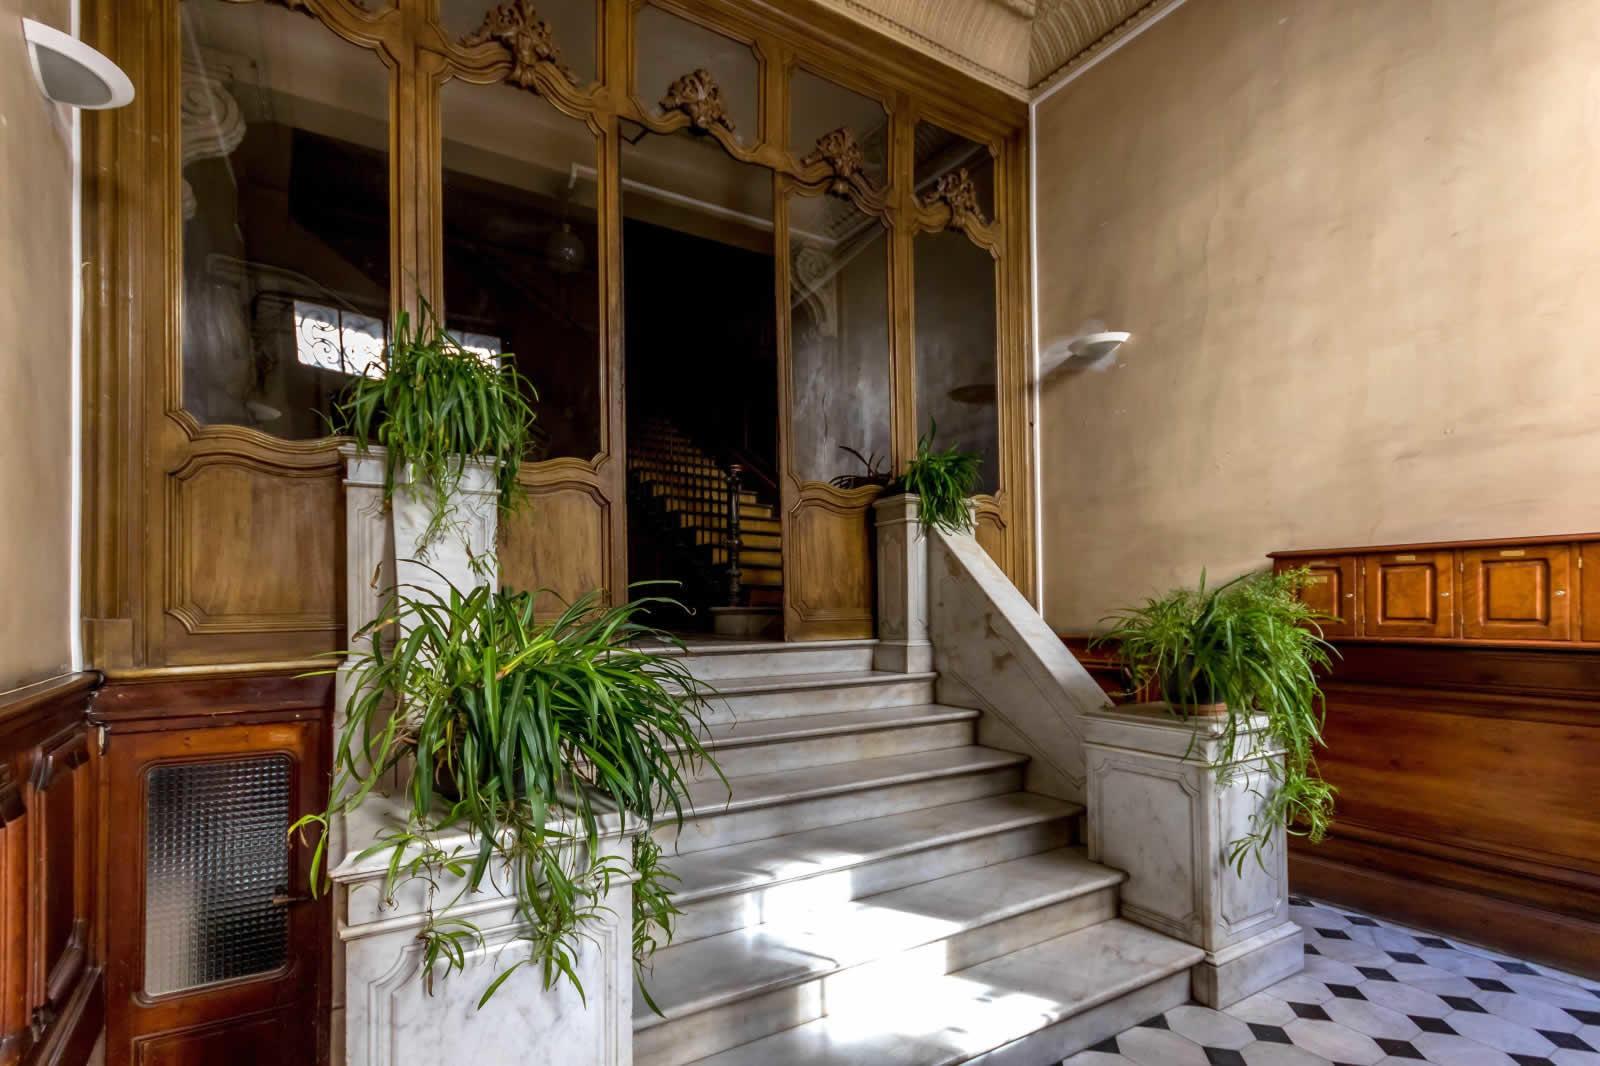 Hotel Bleues Villa Marlioz Reserver Restaurant